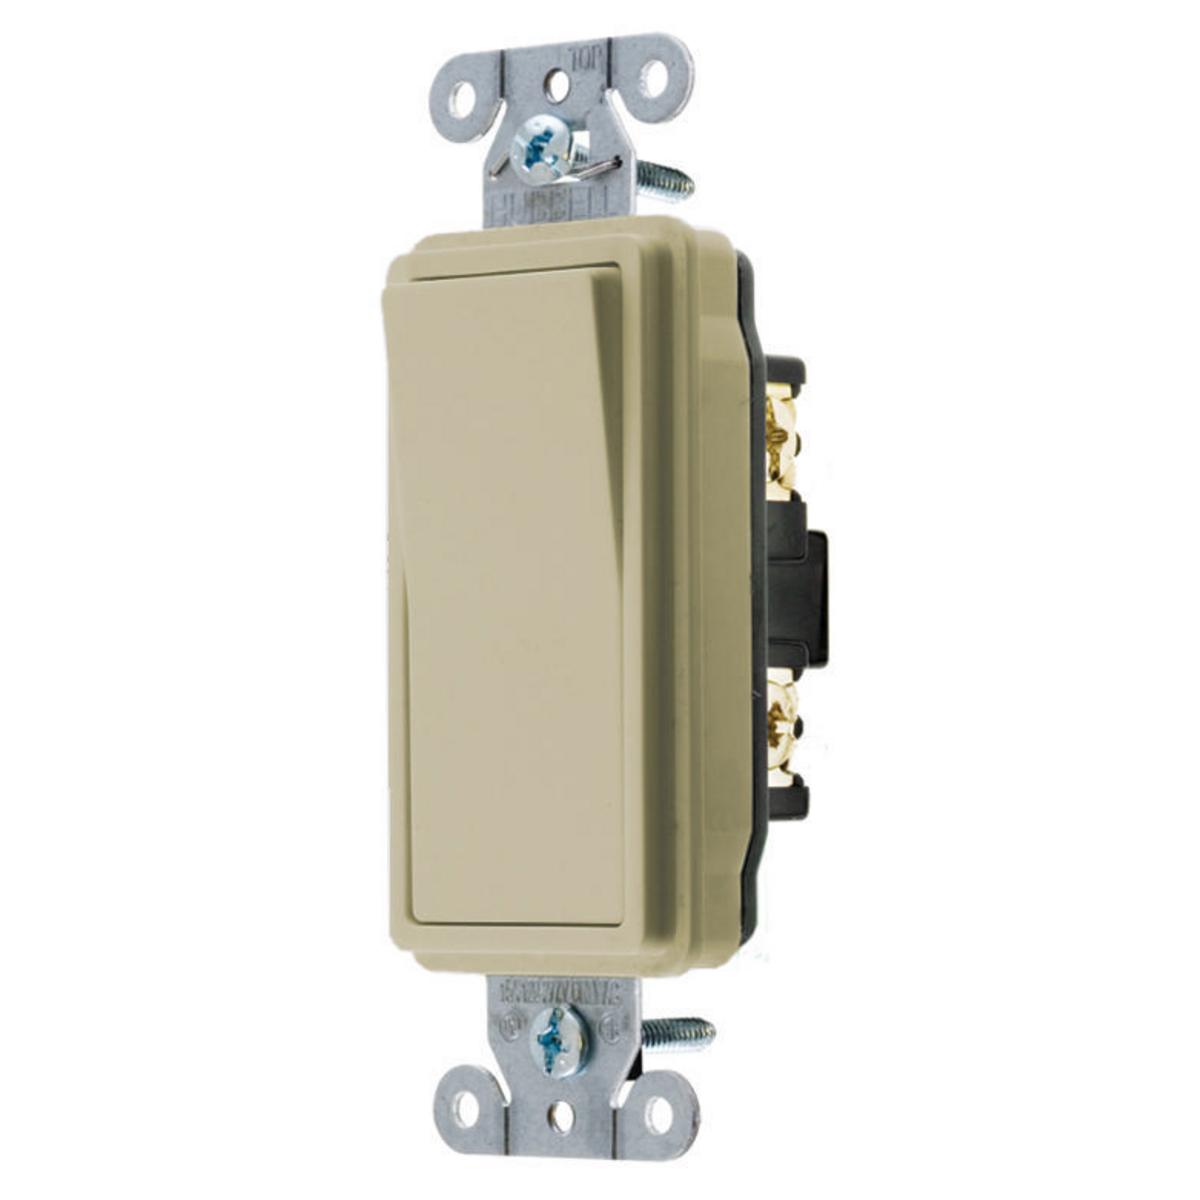 Hubbell DS420I 20 Amp 120/277 VAC 4-Way Ivory Rocker Switch